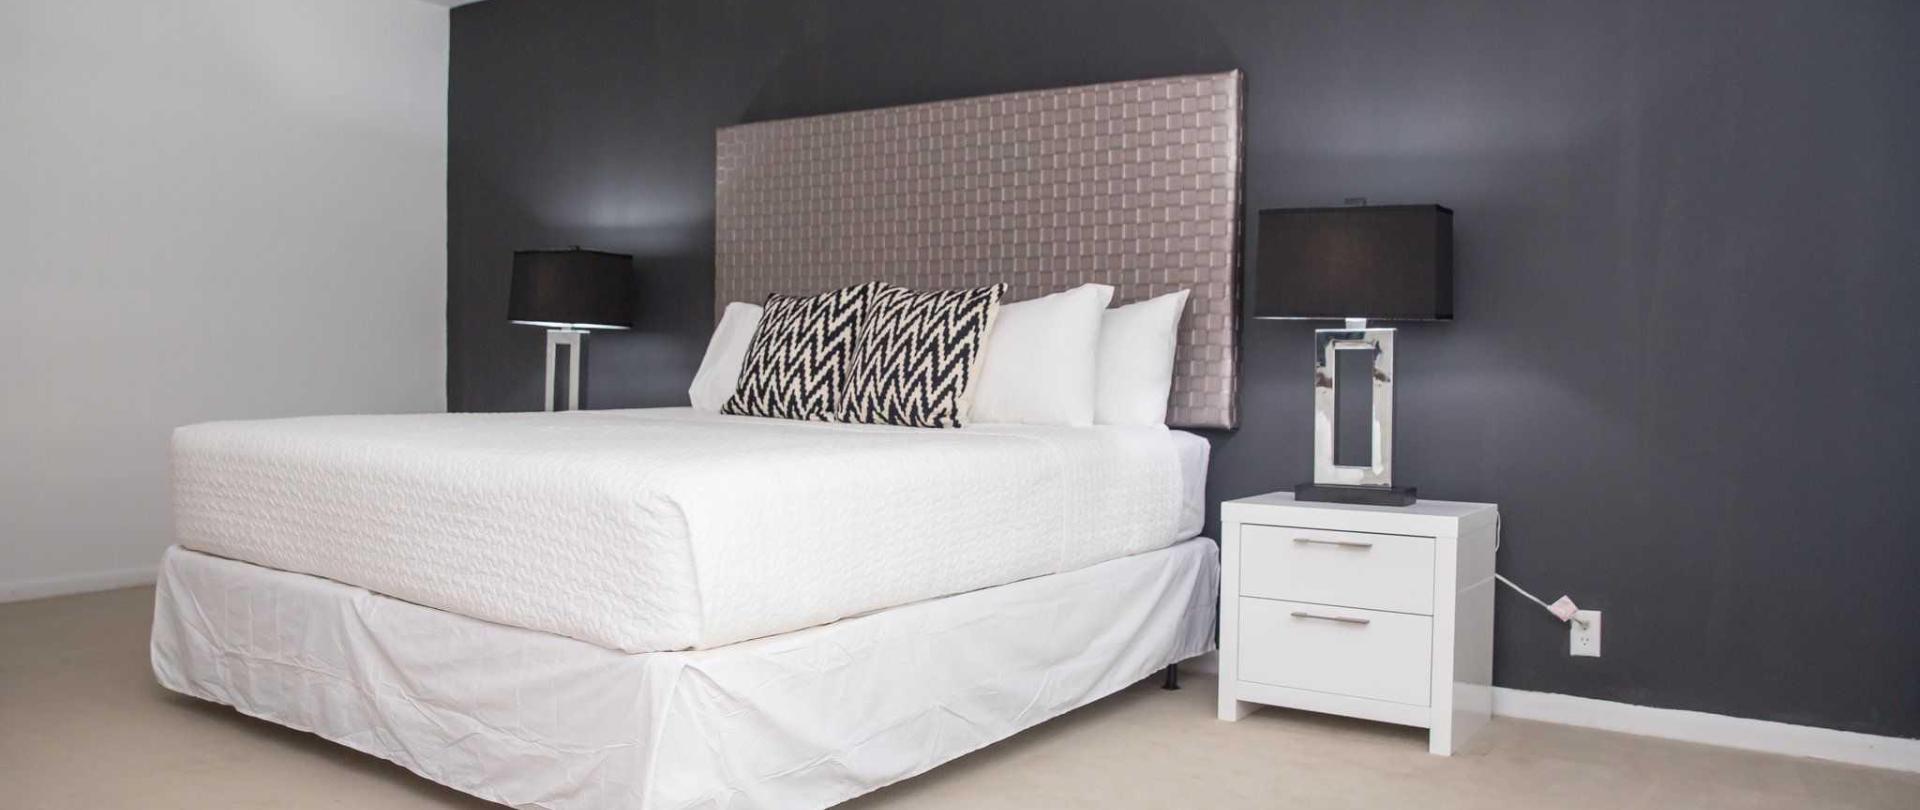 ct-2-br-jr-2-bedroom1-1-3.jpg